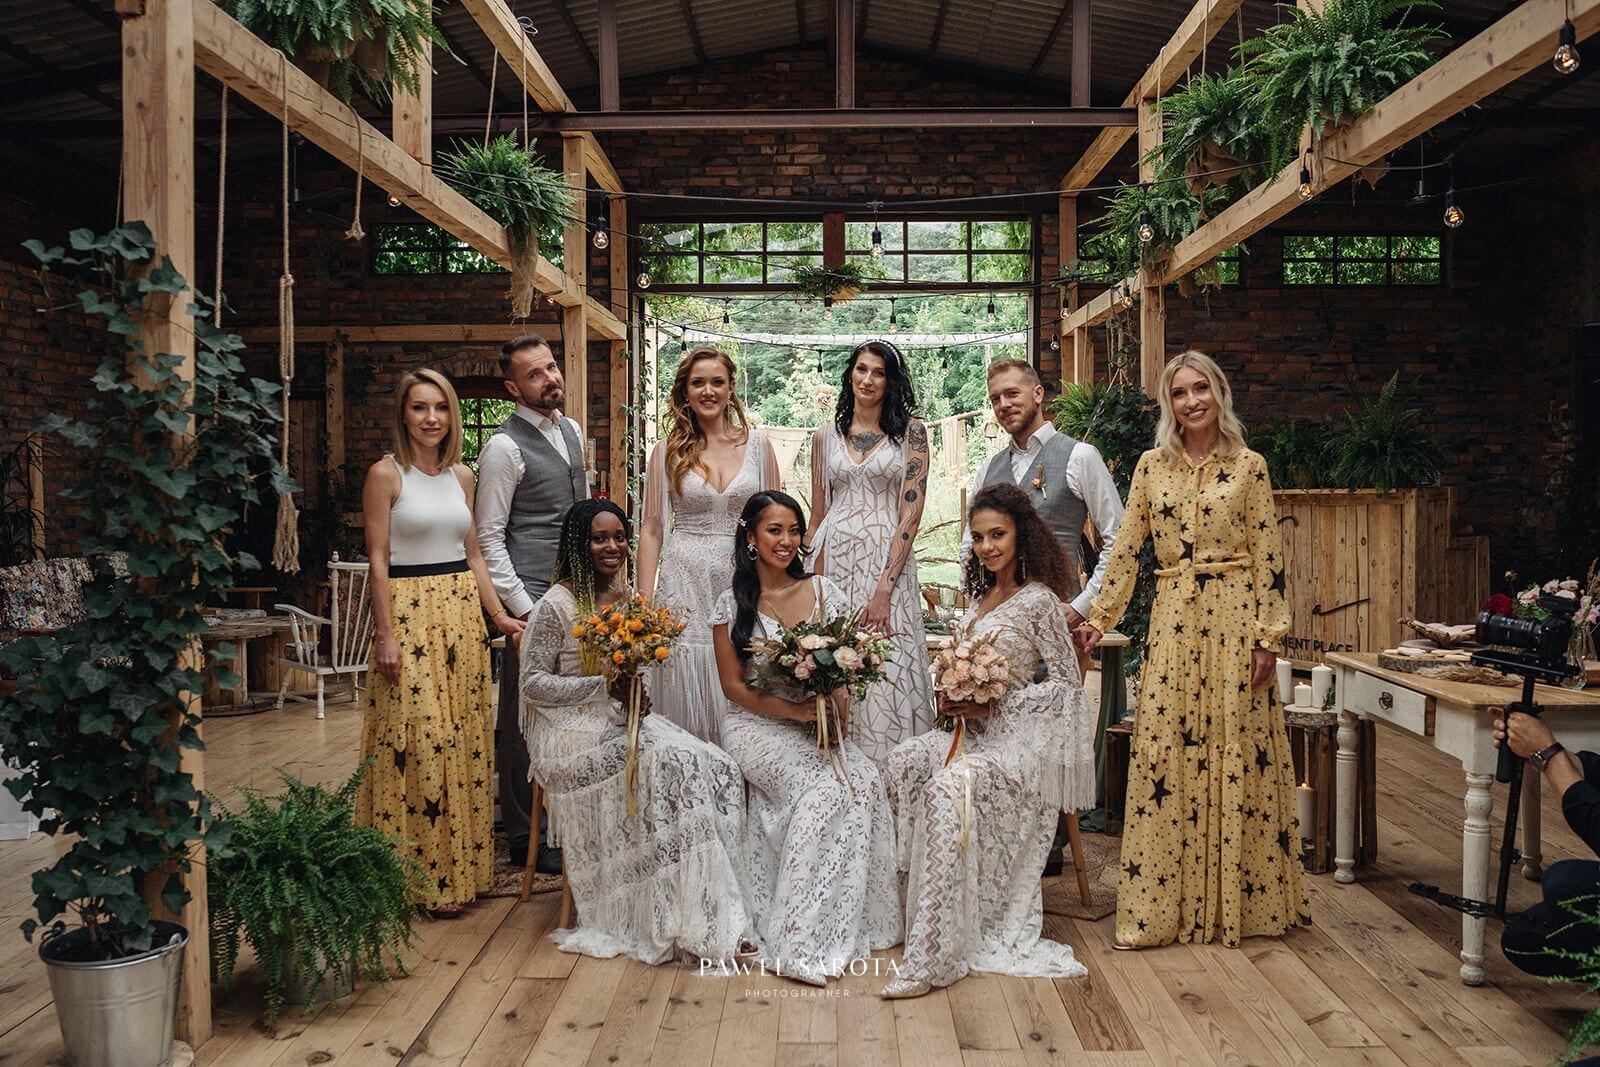 Ślubna Pracownia - Onas